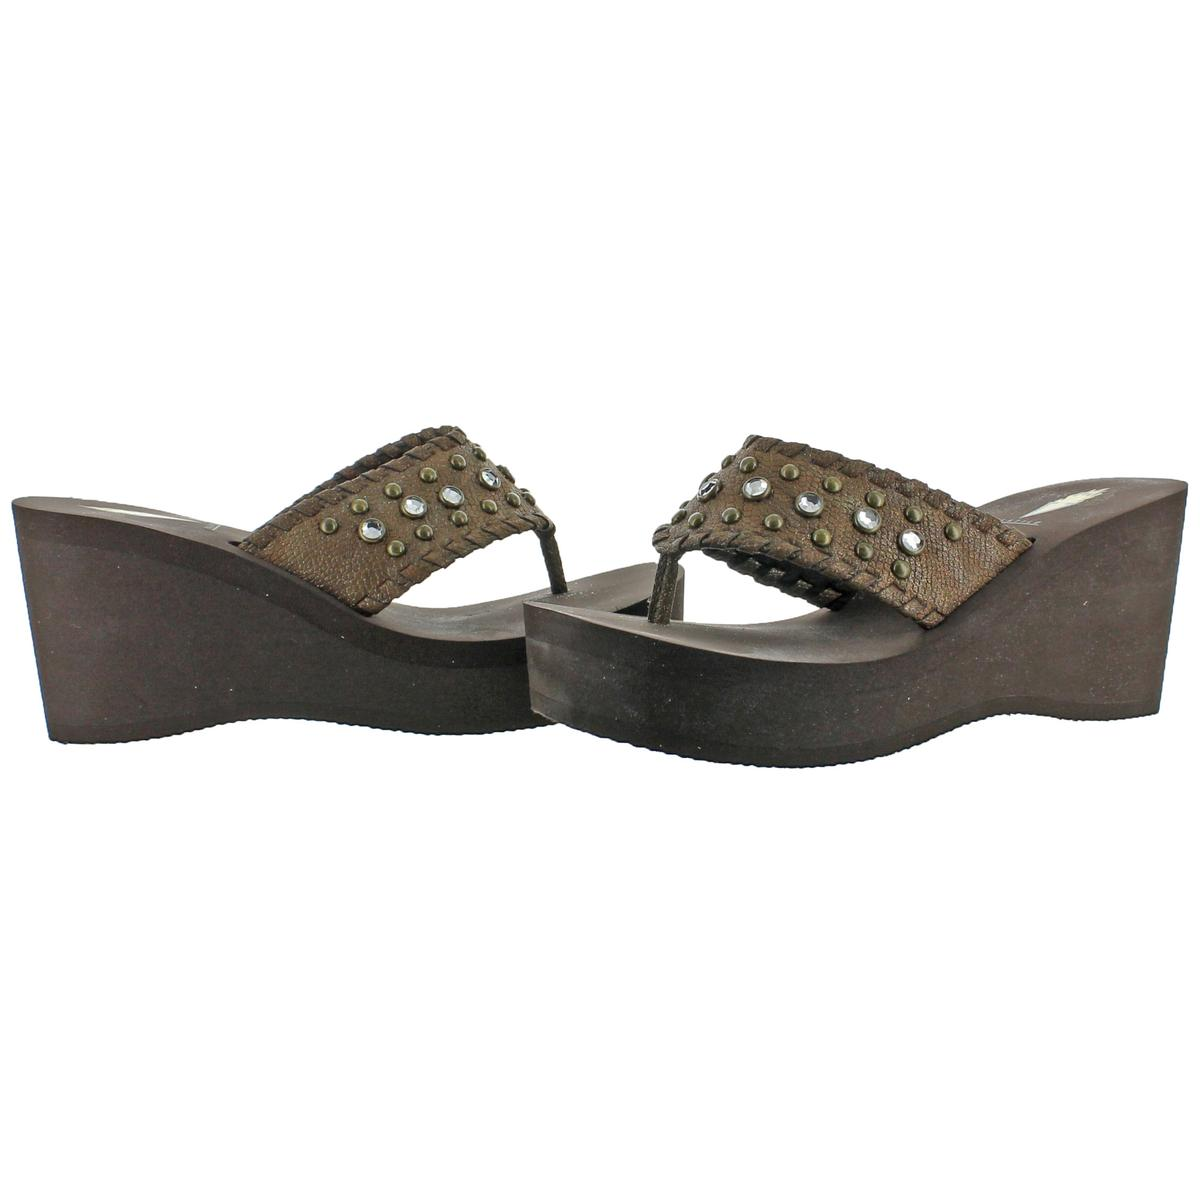 Volatile-Billyray-Women-039-s-Studded-Metallic-Slip-On-Platform-Wedge-Sandals-Shoes thumbnail 3